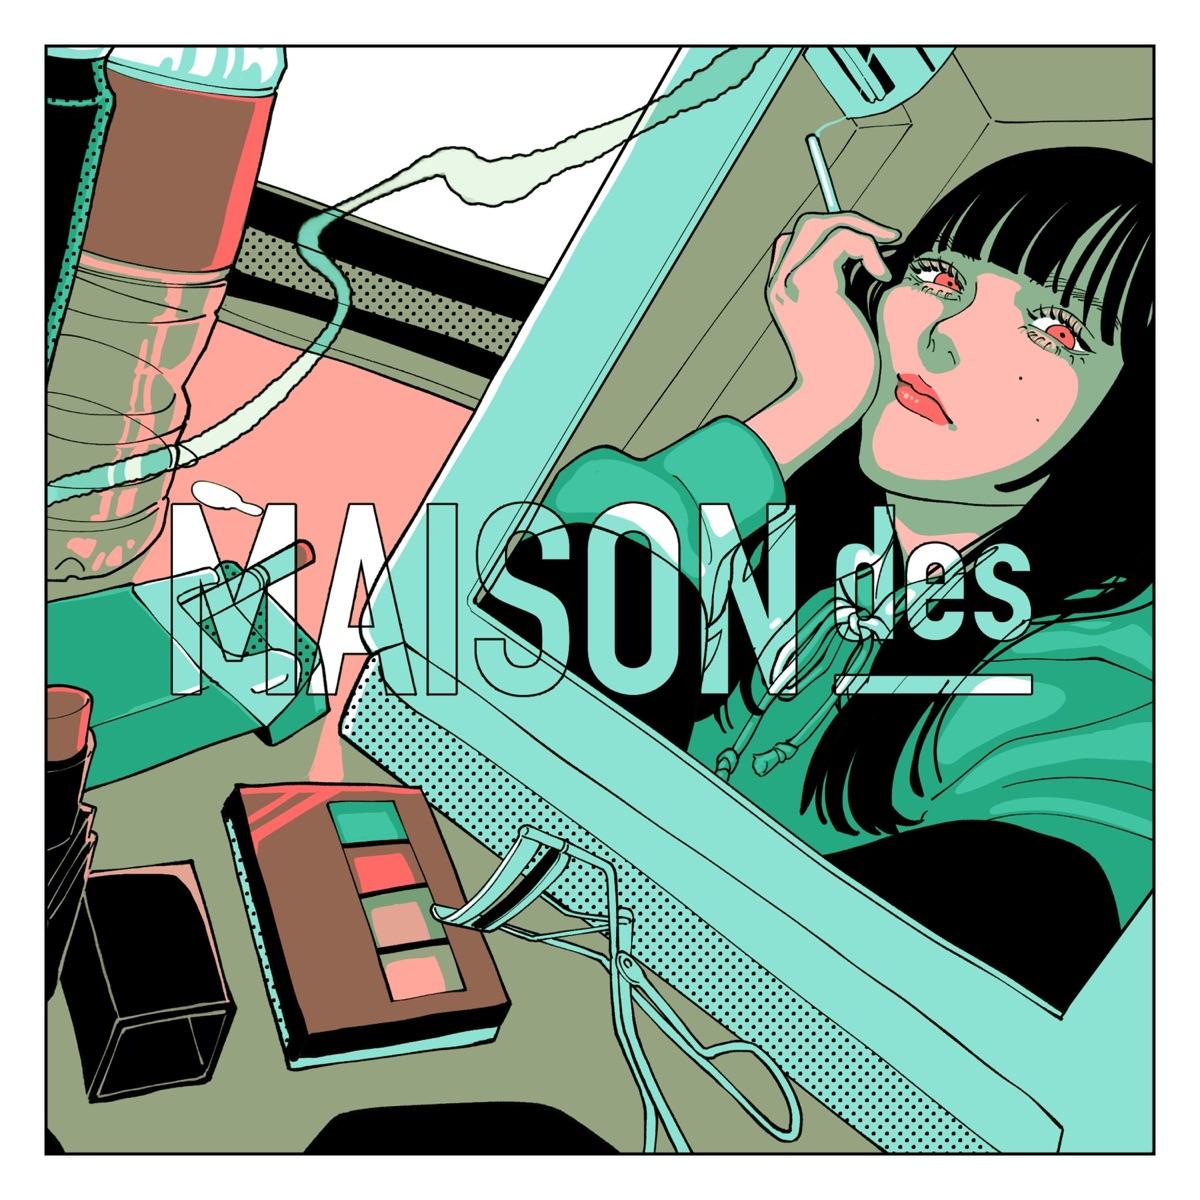 『MAISONdes - Hello/Hello feat. yama, 泣き虫☔』収録の『Hello/Hello feat. yama, 泣き虫☔』ジャケット